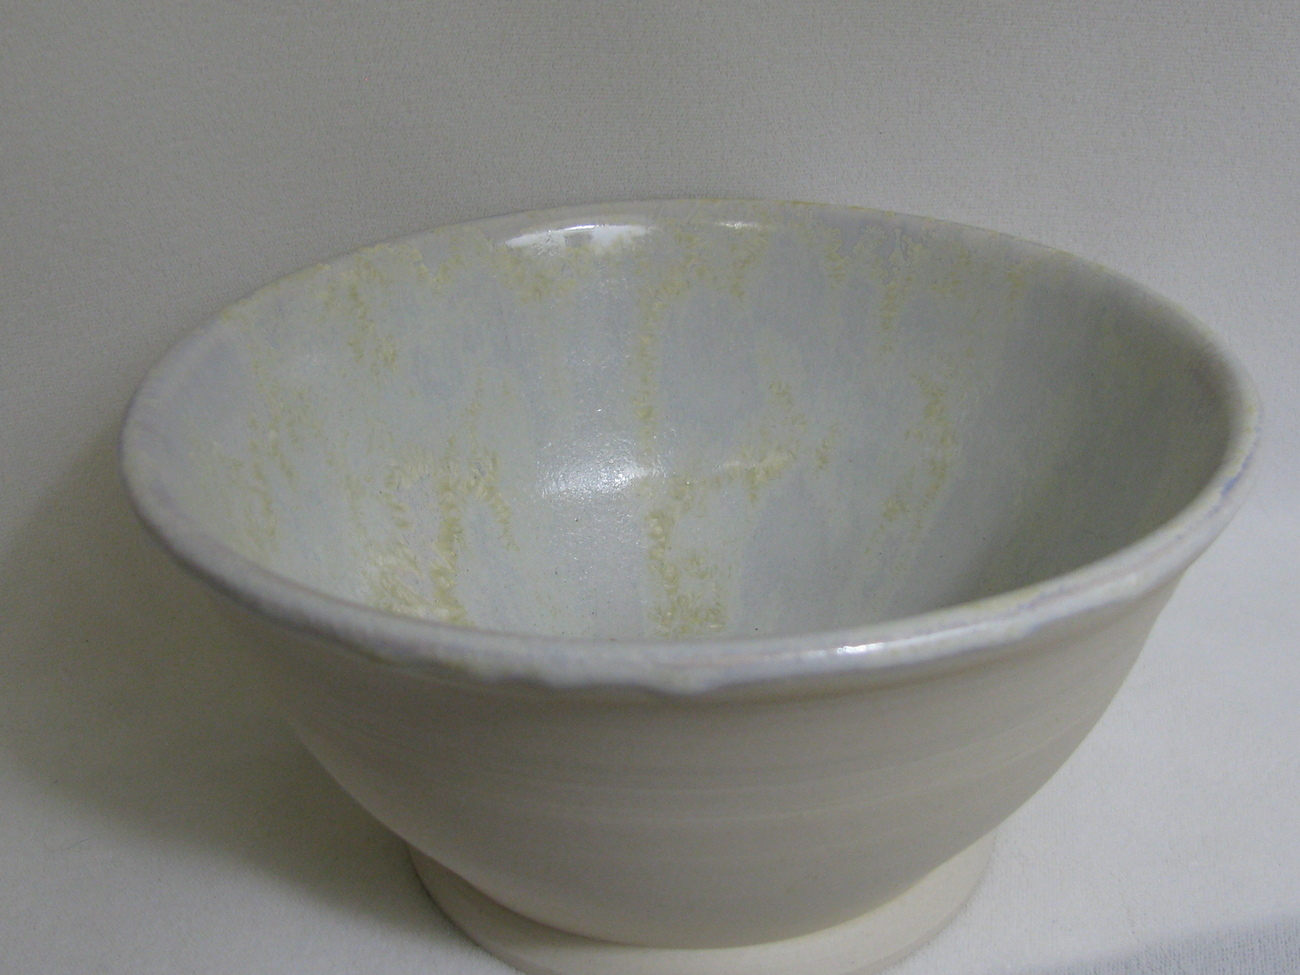 Porcelain Bowl with Crystalline Glaze RKC14